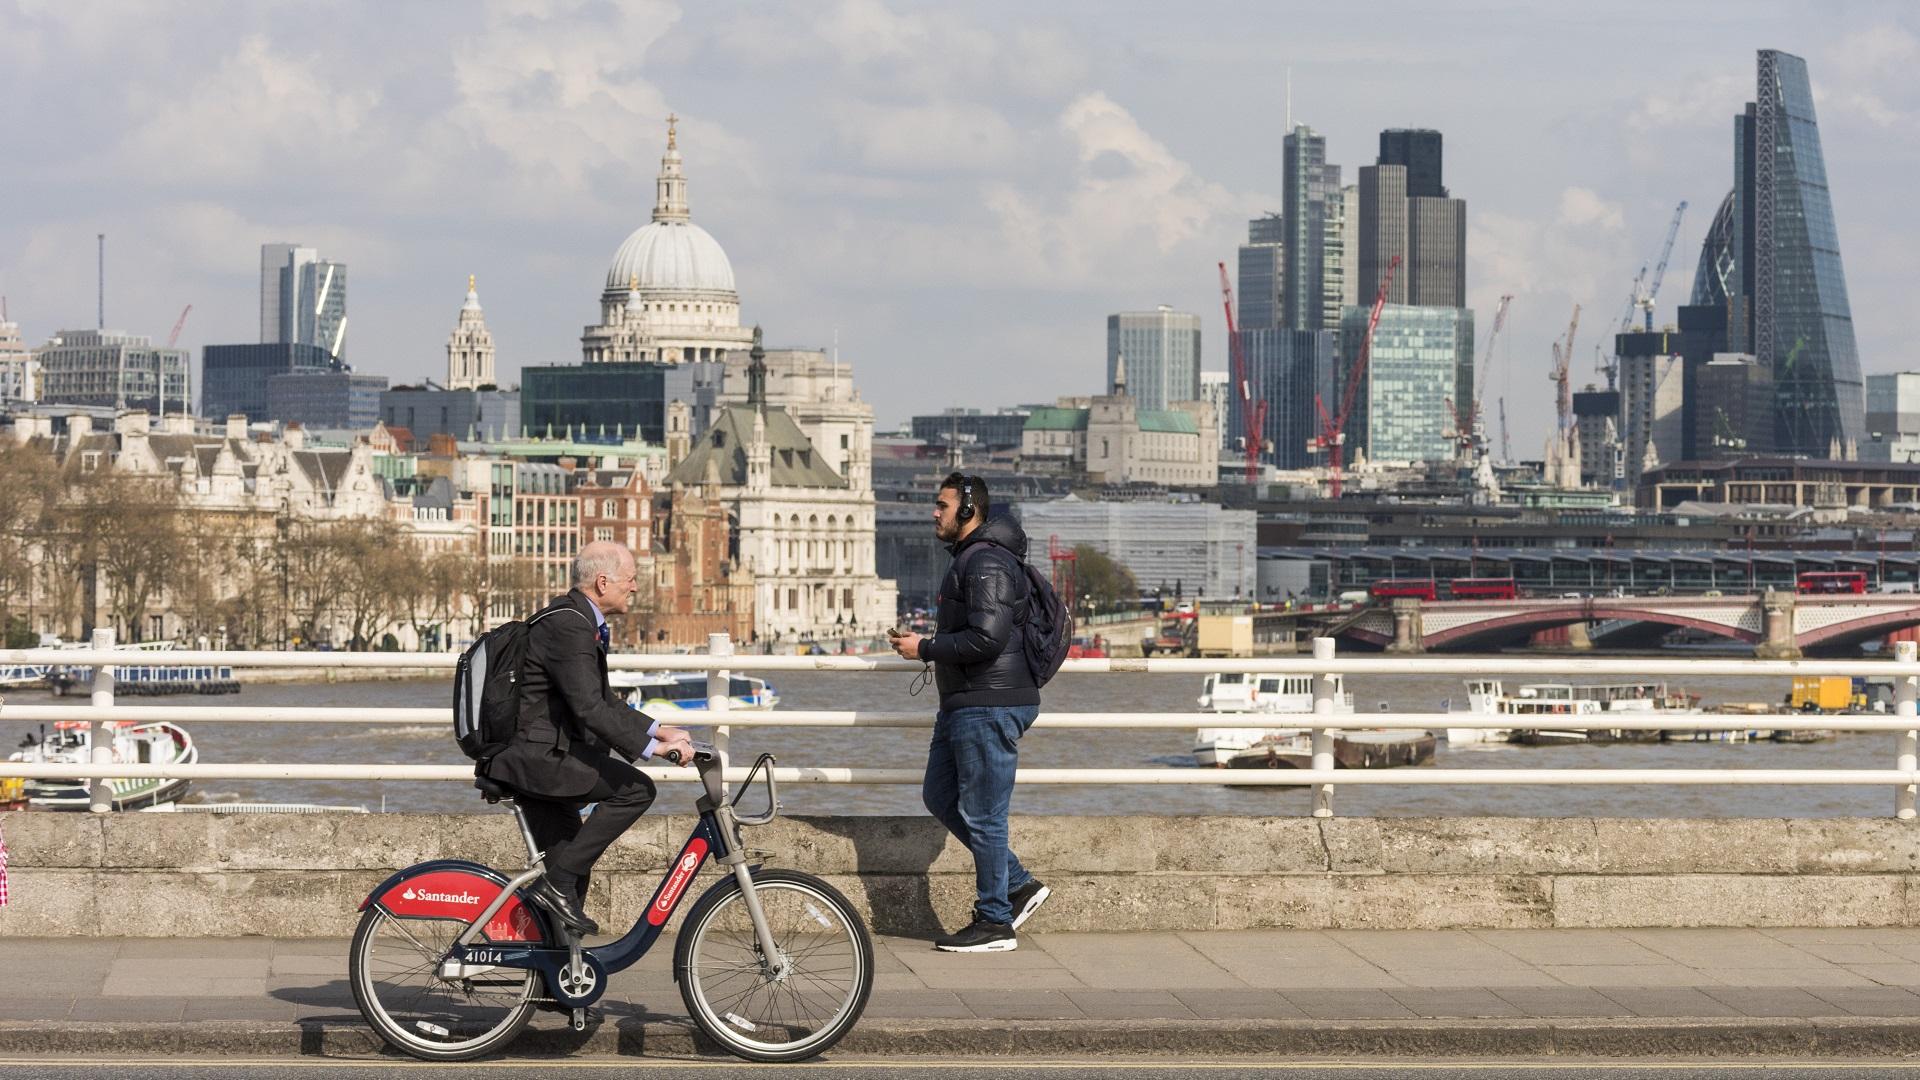 man cycling on bridge on a Santander Bike in front of London skyline